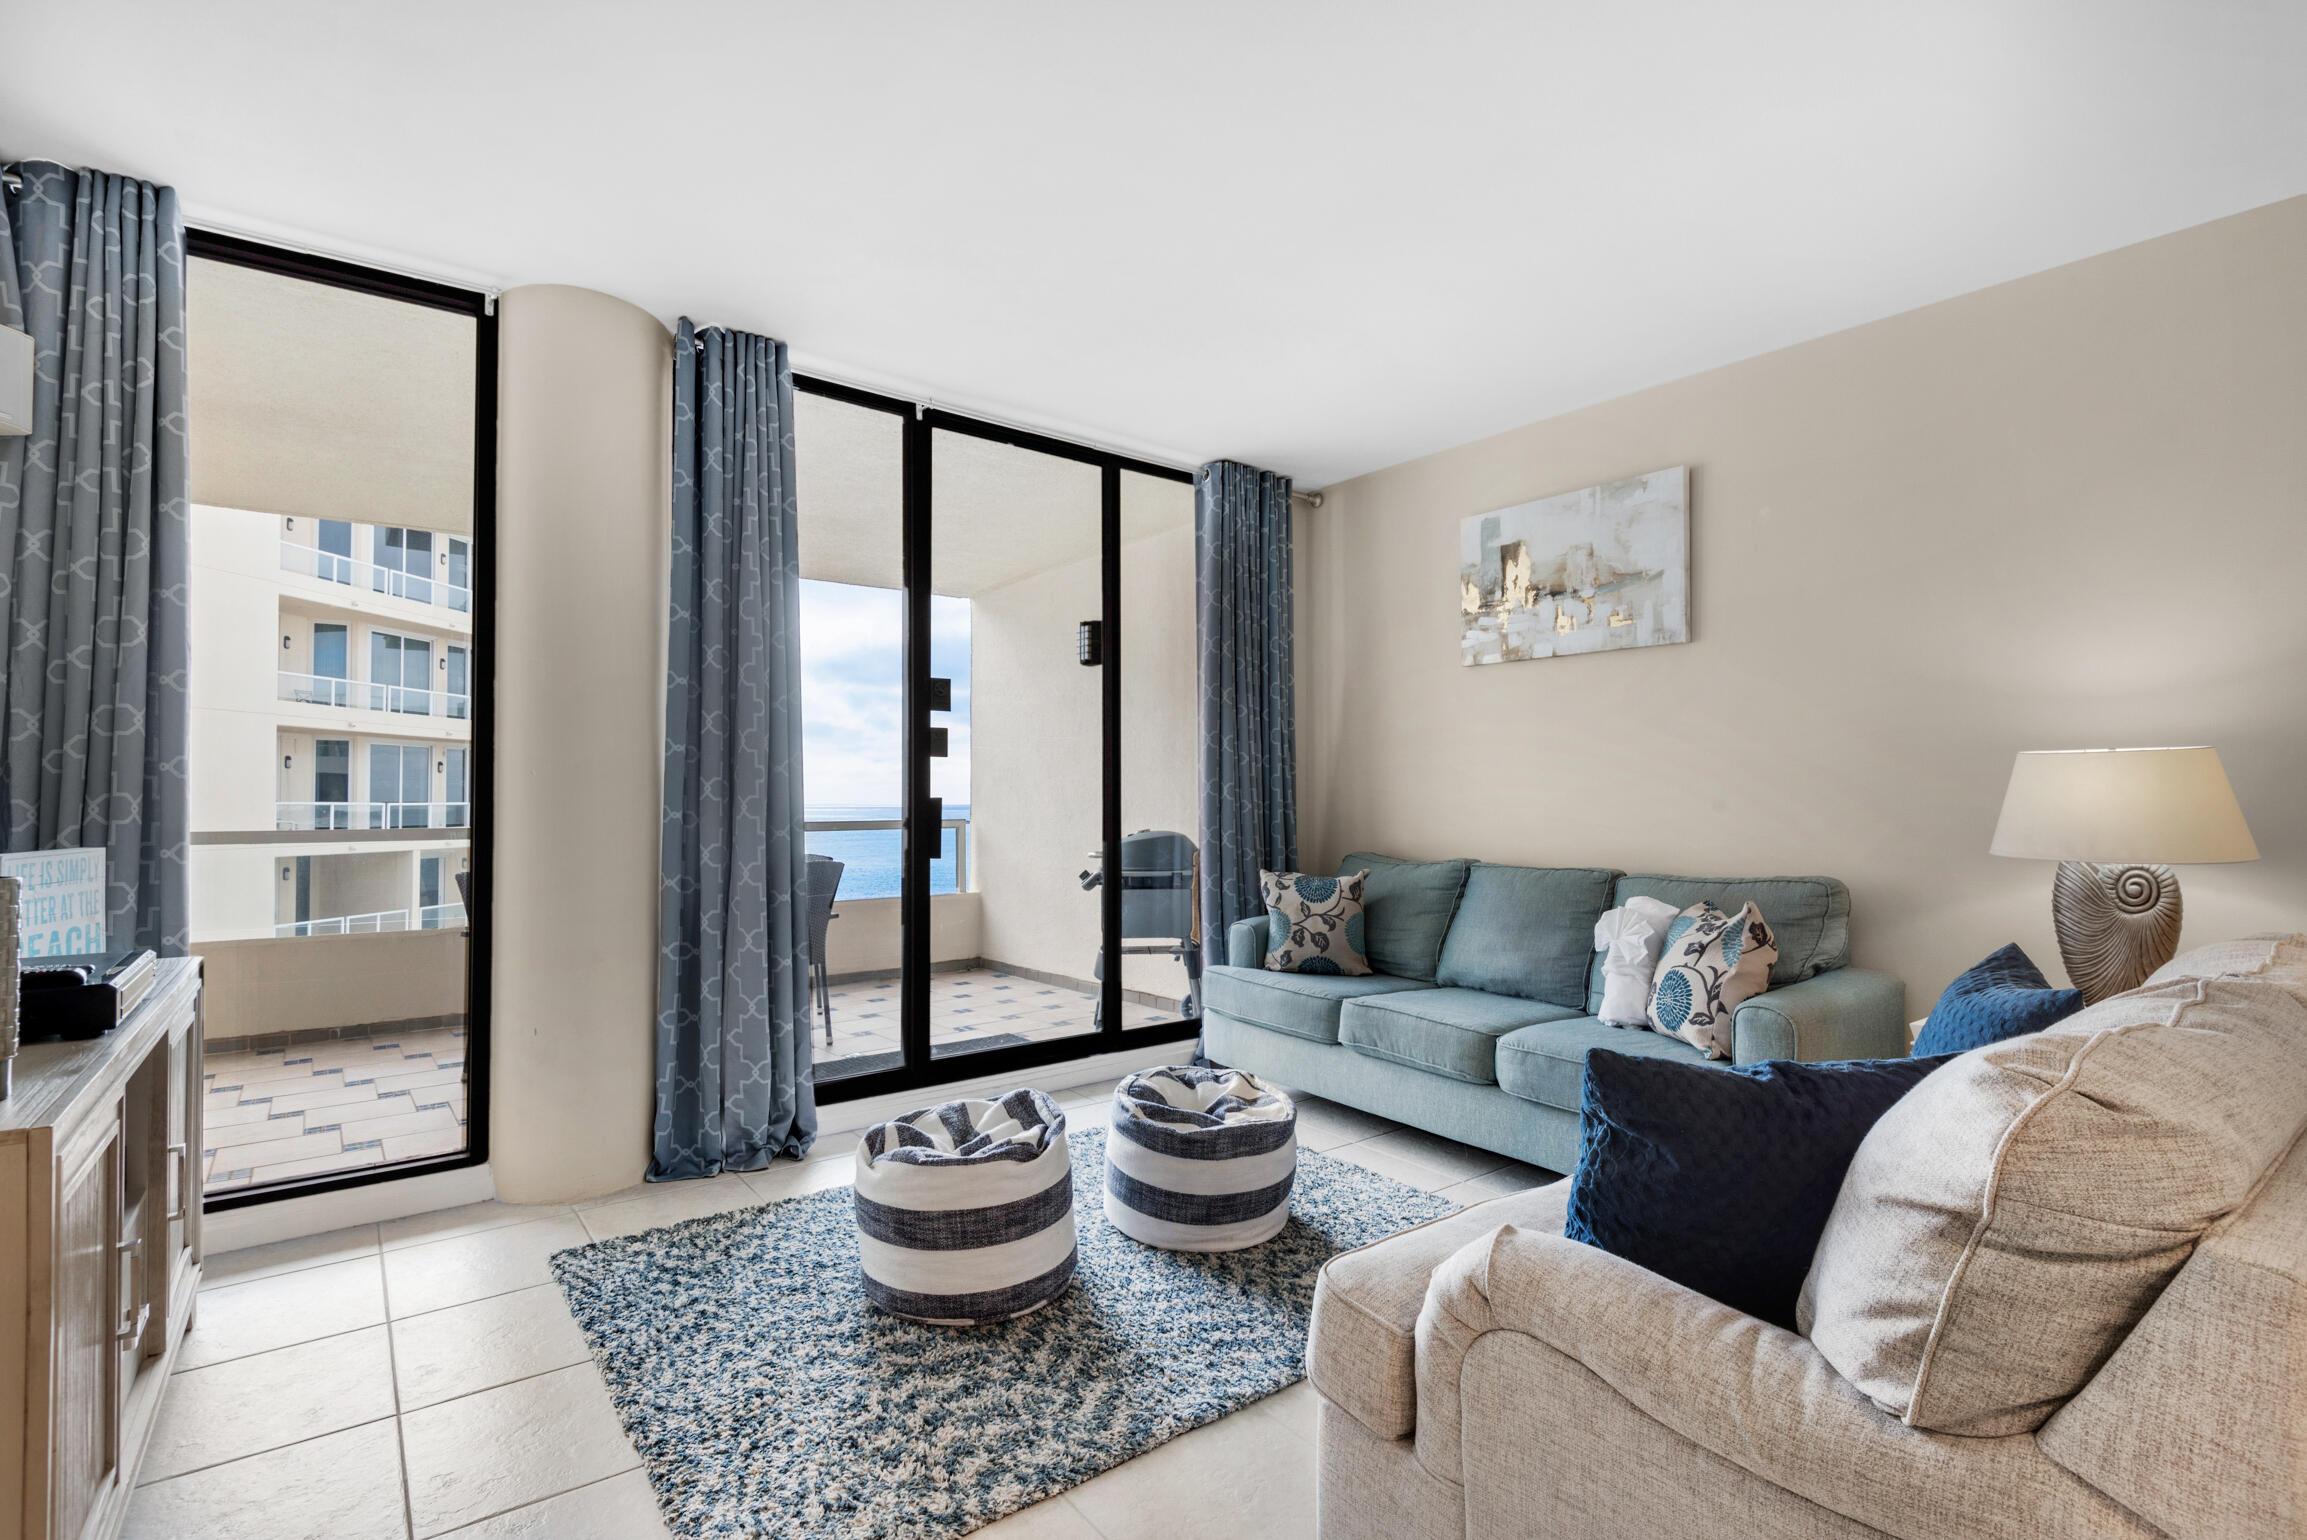 A 2 Bedroom 2 Bedroom East Pass Towers Condo Condominium